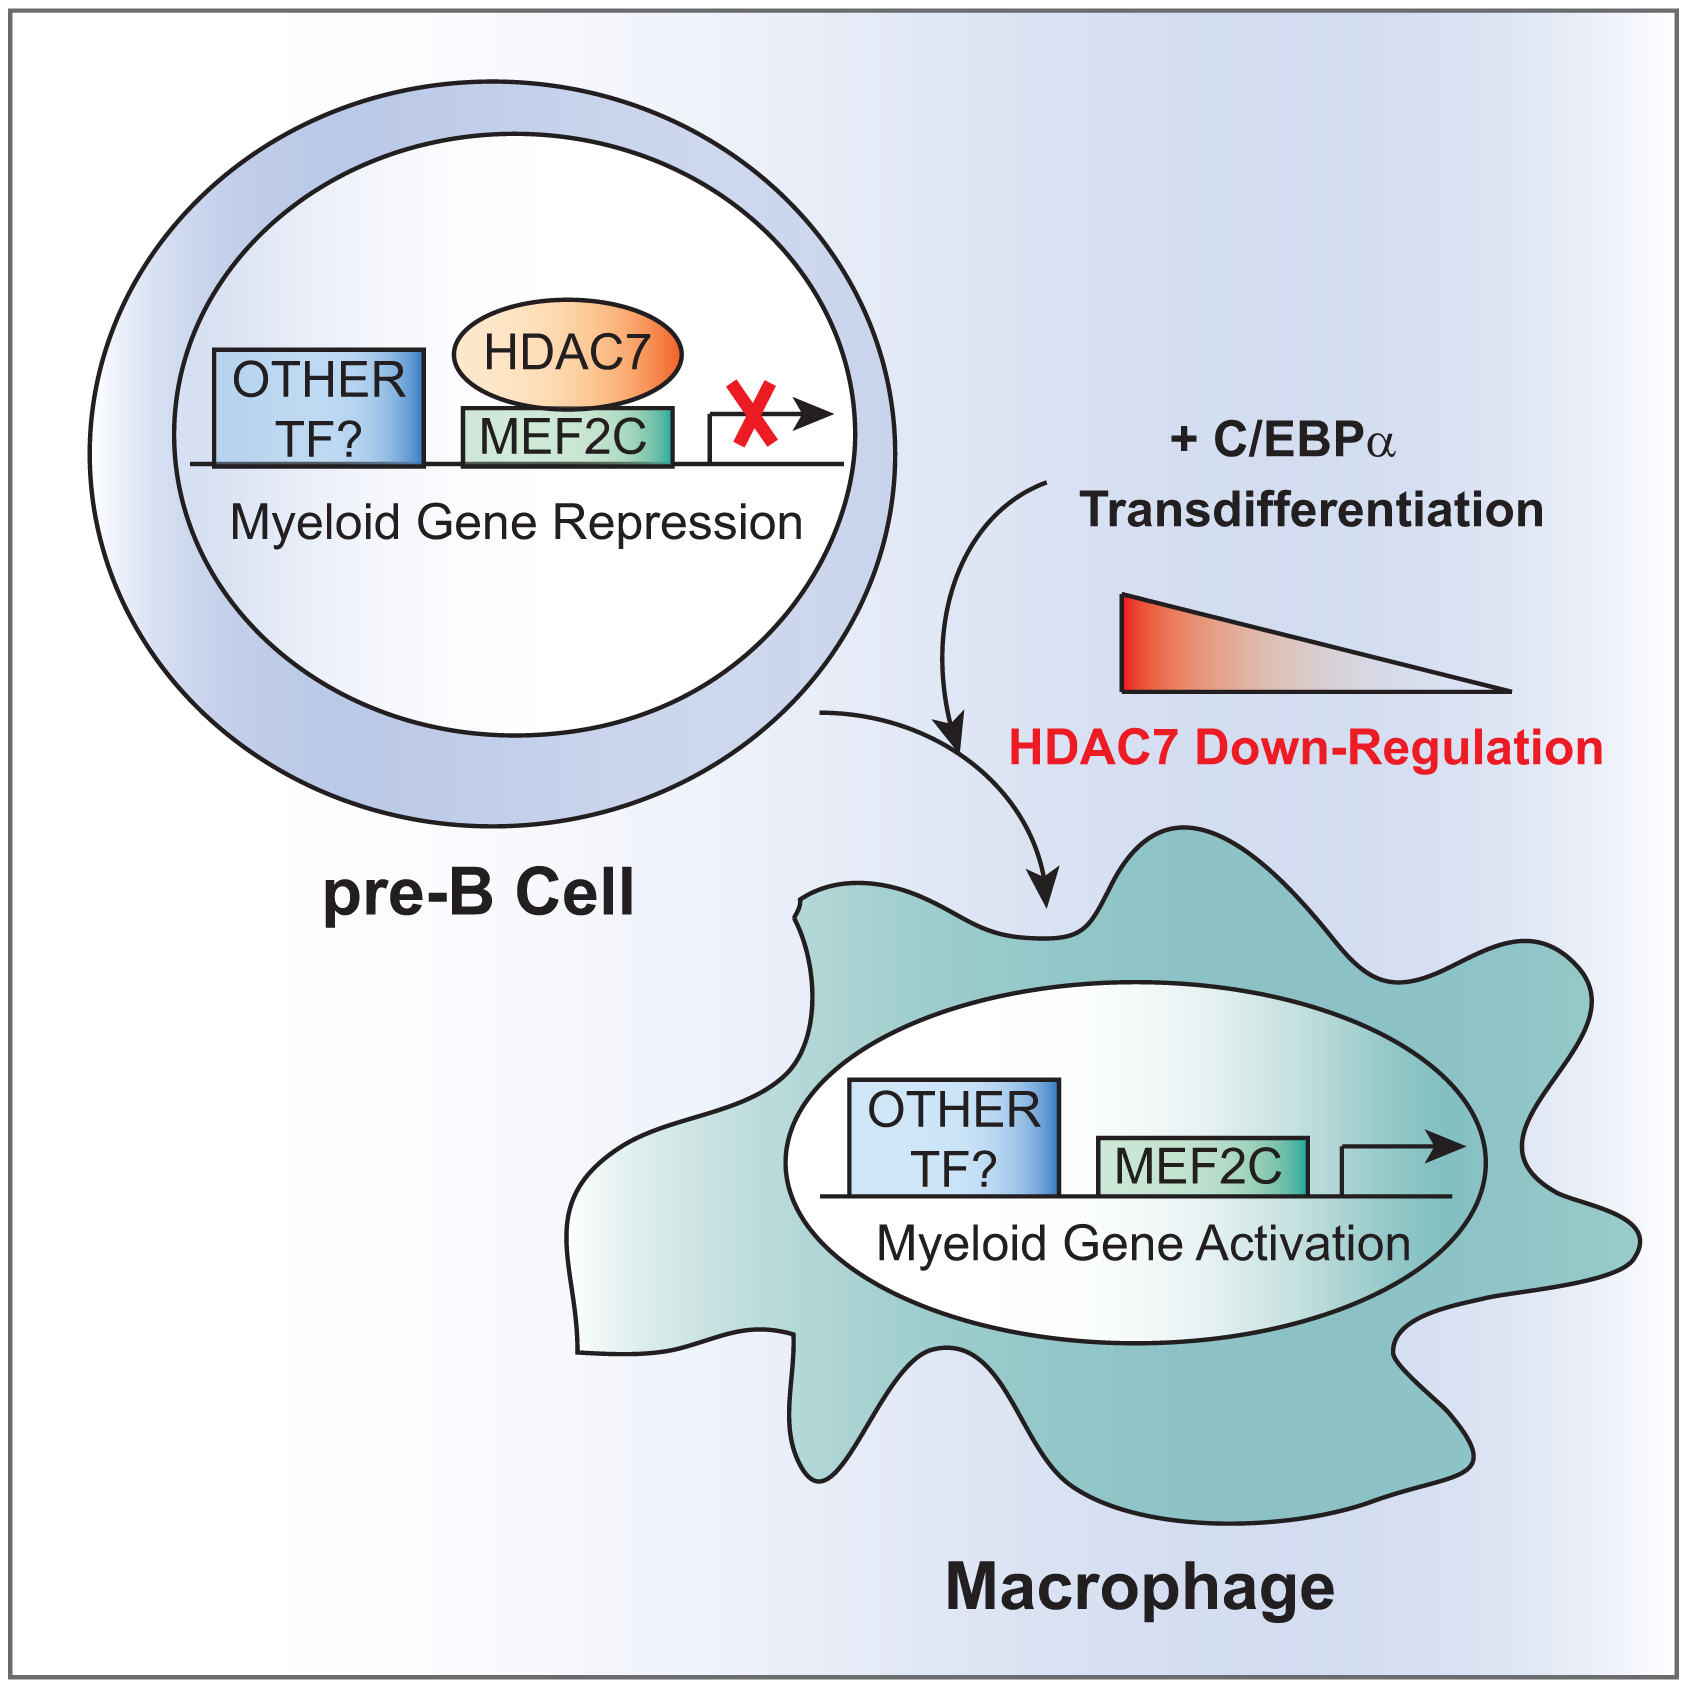 Model for HDAC7-mediated transcriptional repression in pre-B cells.